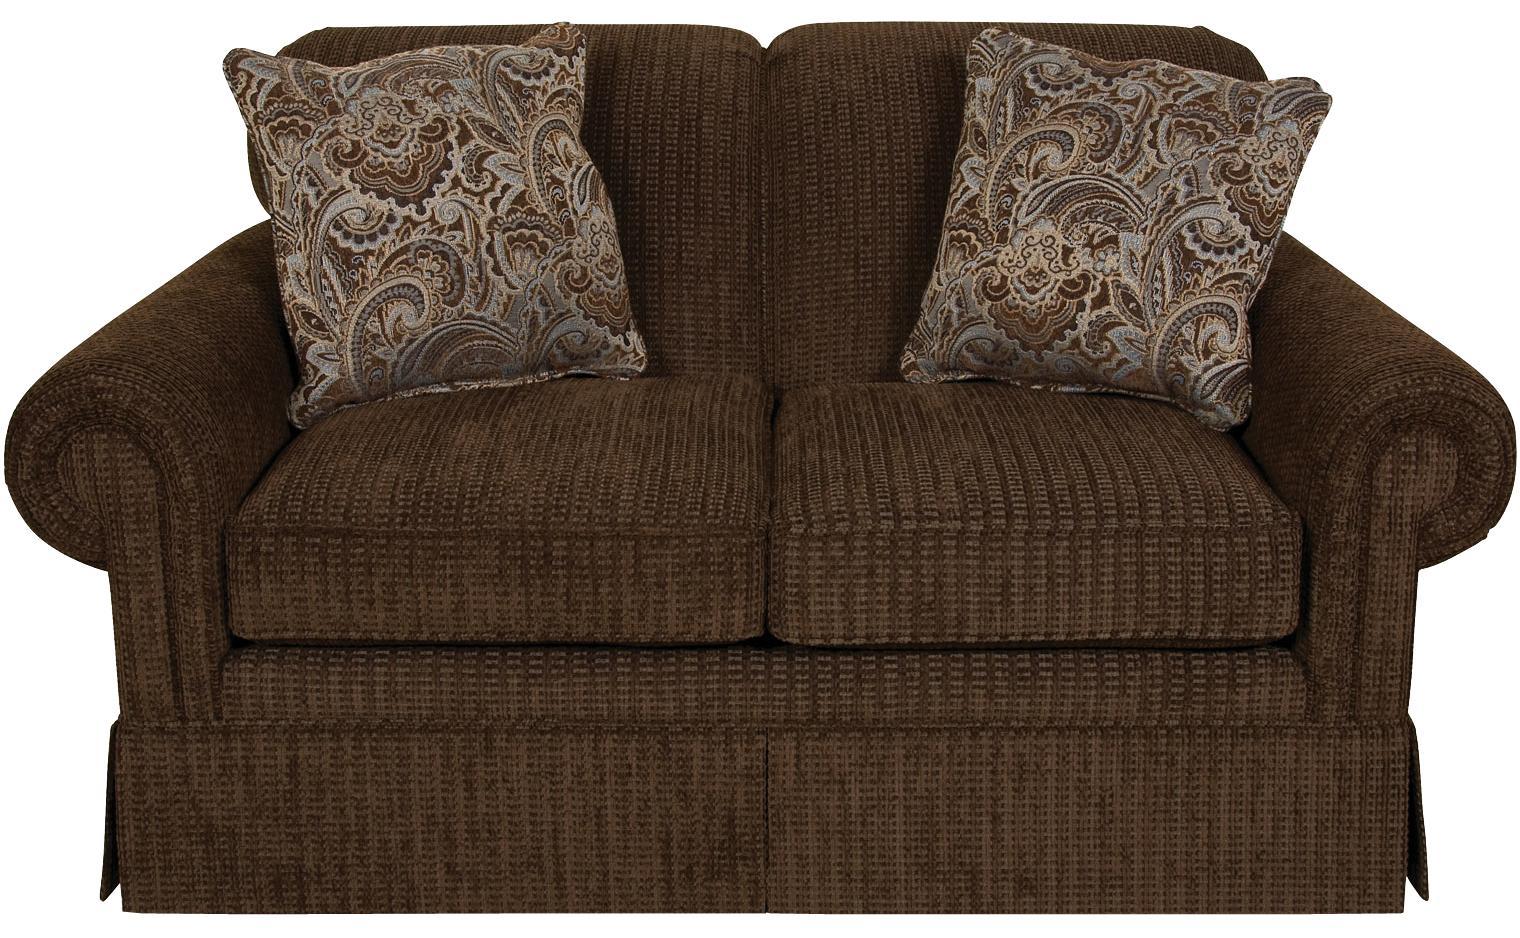 England Nancy Classic Upholstered Loveseat Furniture